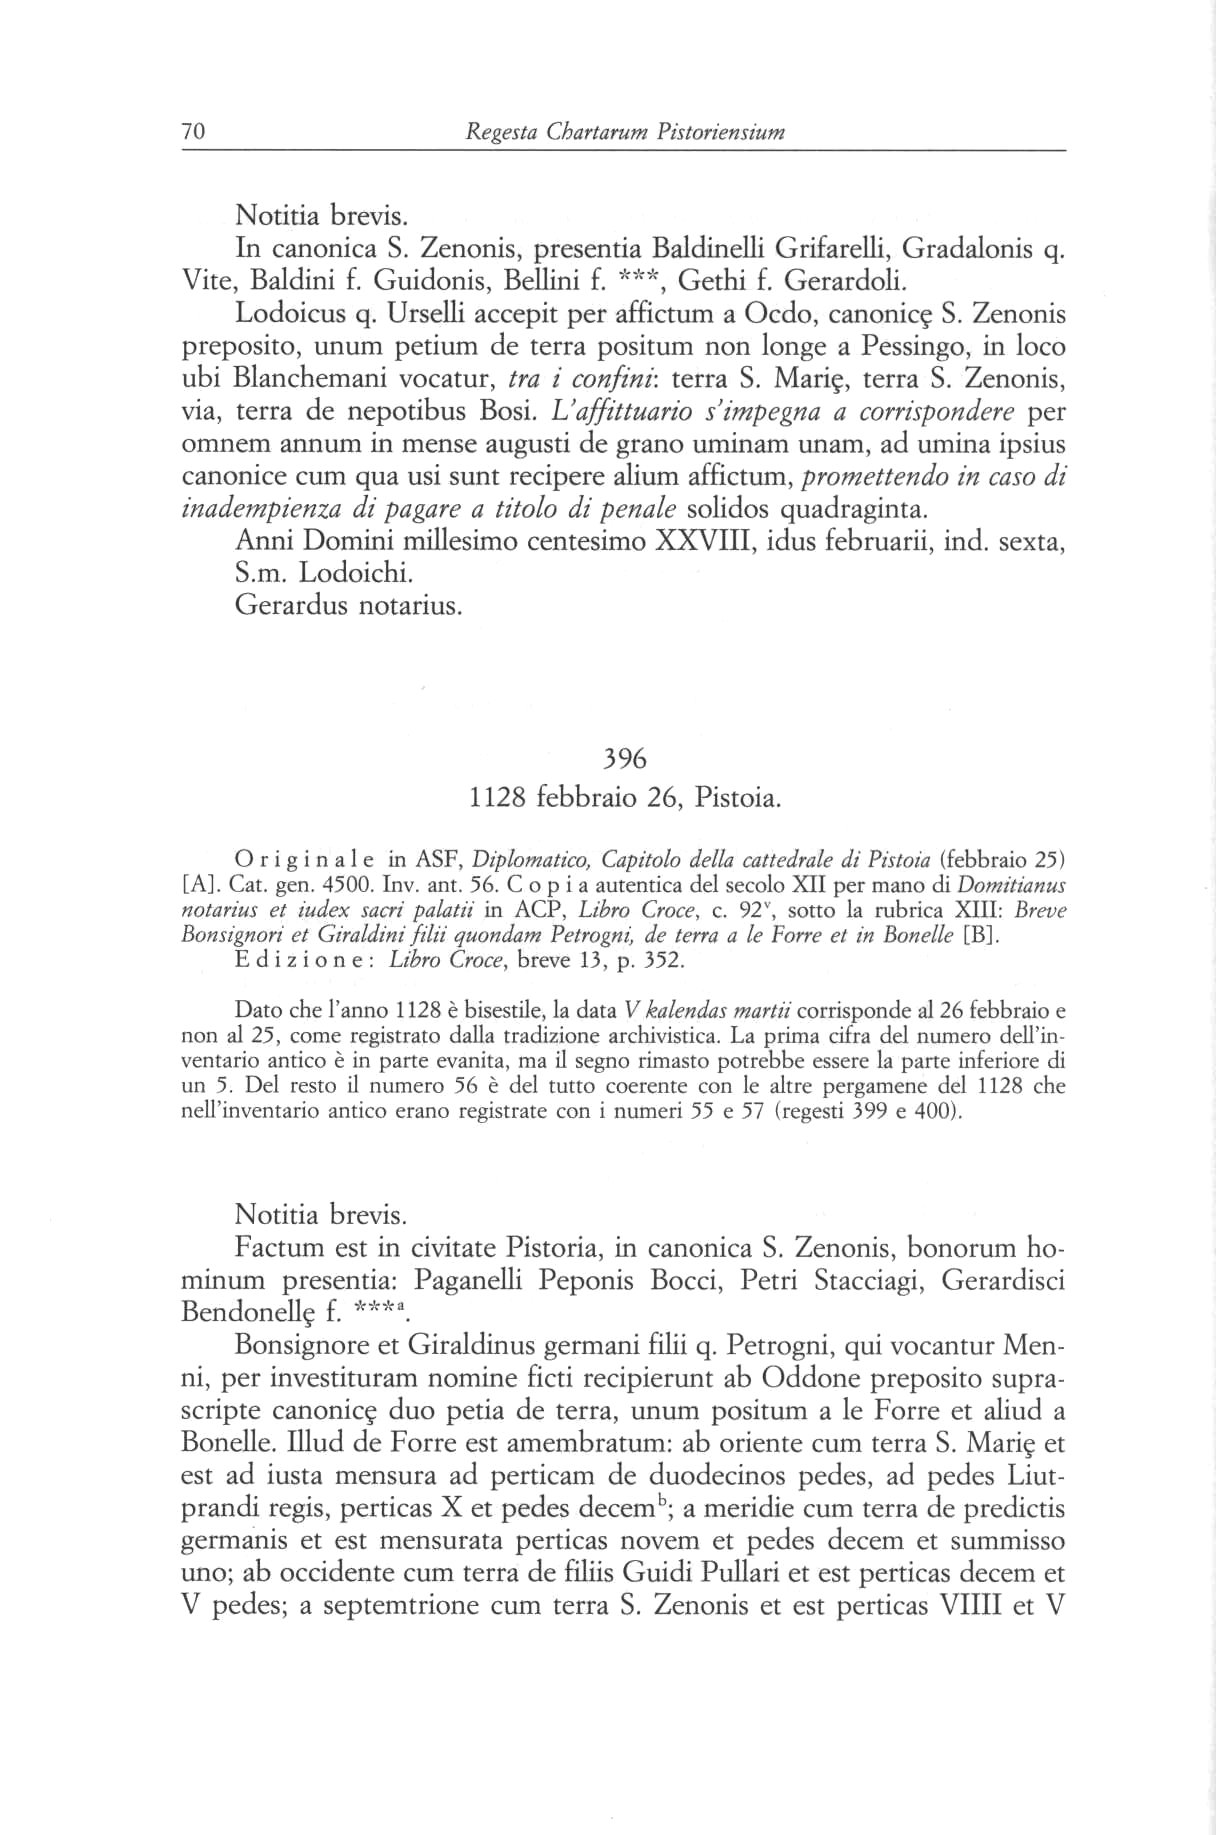 Canonica S. Zenone XII 0070.jpg